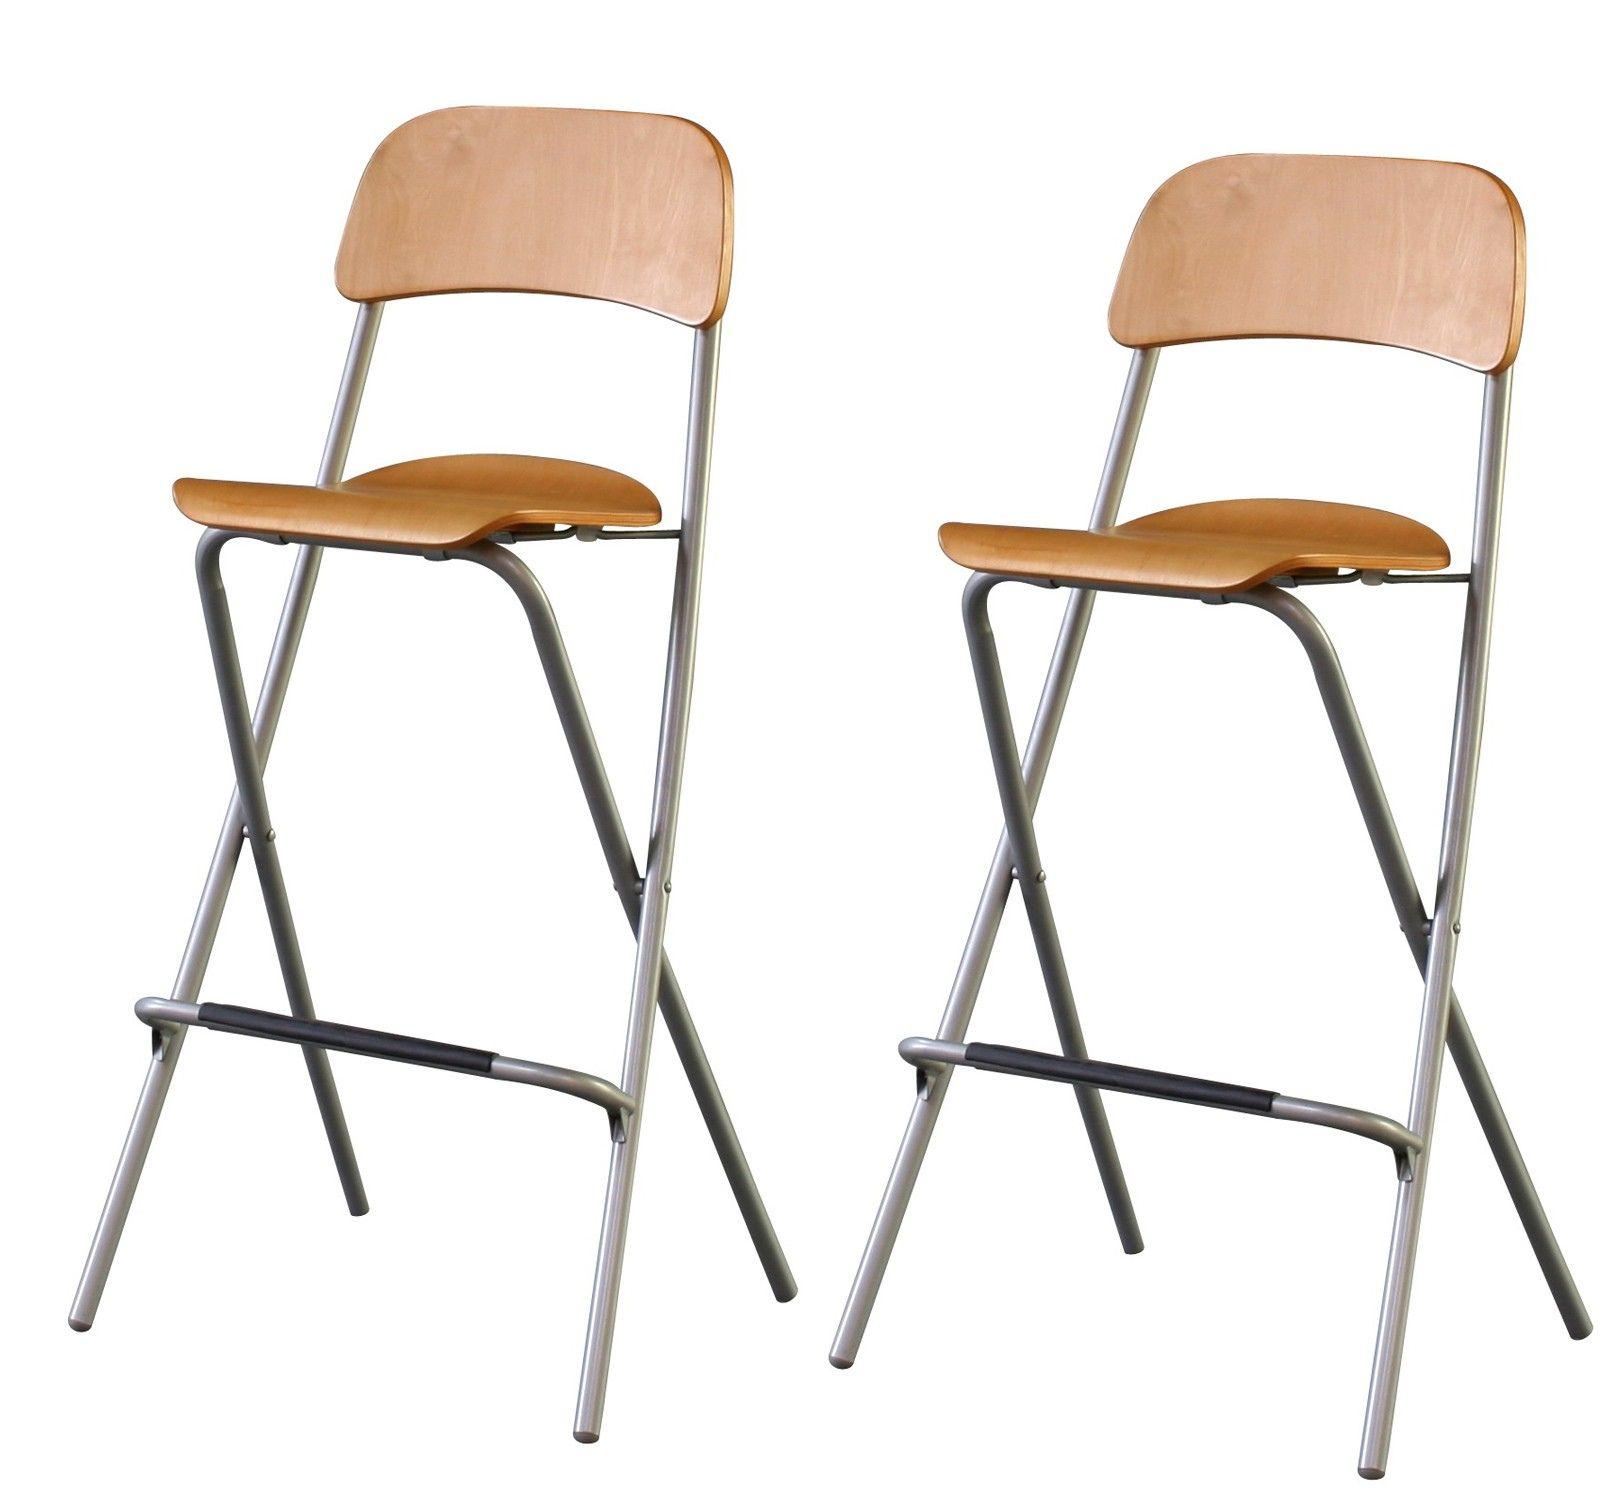 55 Ikea Folding Bar Stool Modern Used Furniture Check More At